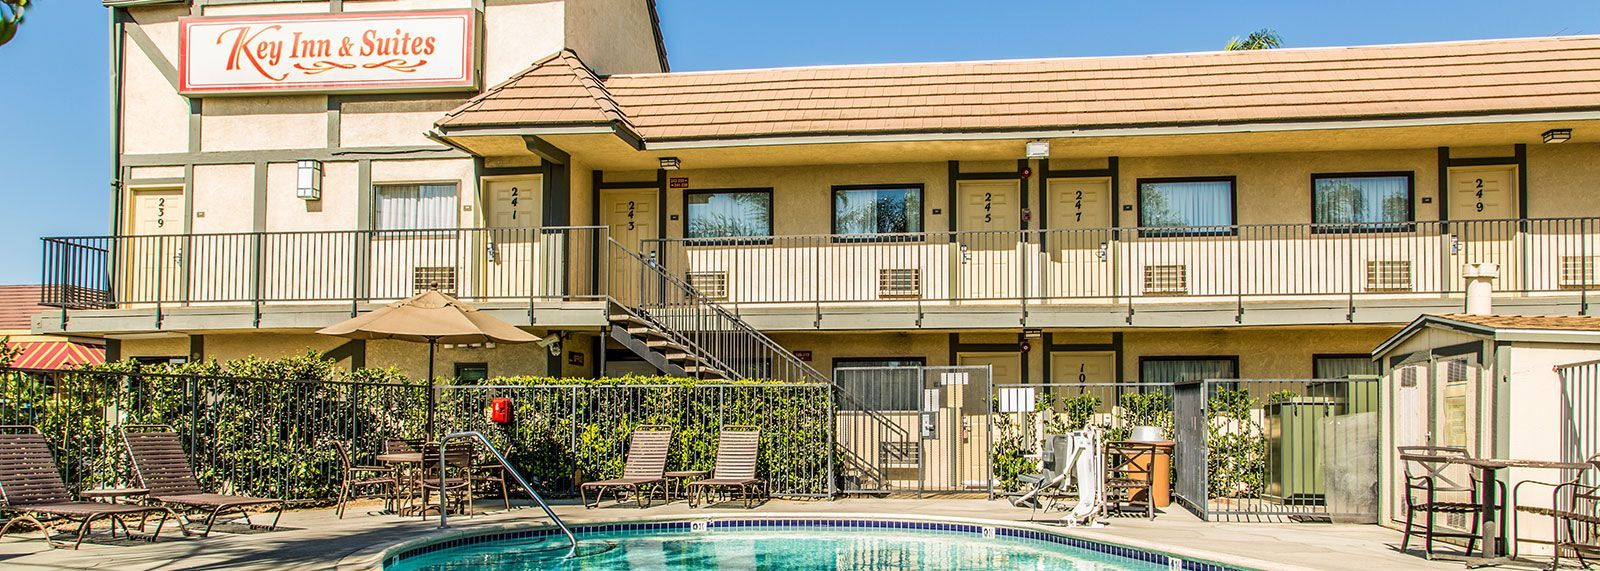 key-inn-and-suites-tustin-california-home1-top